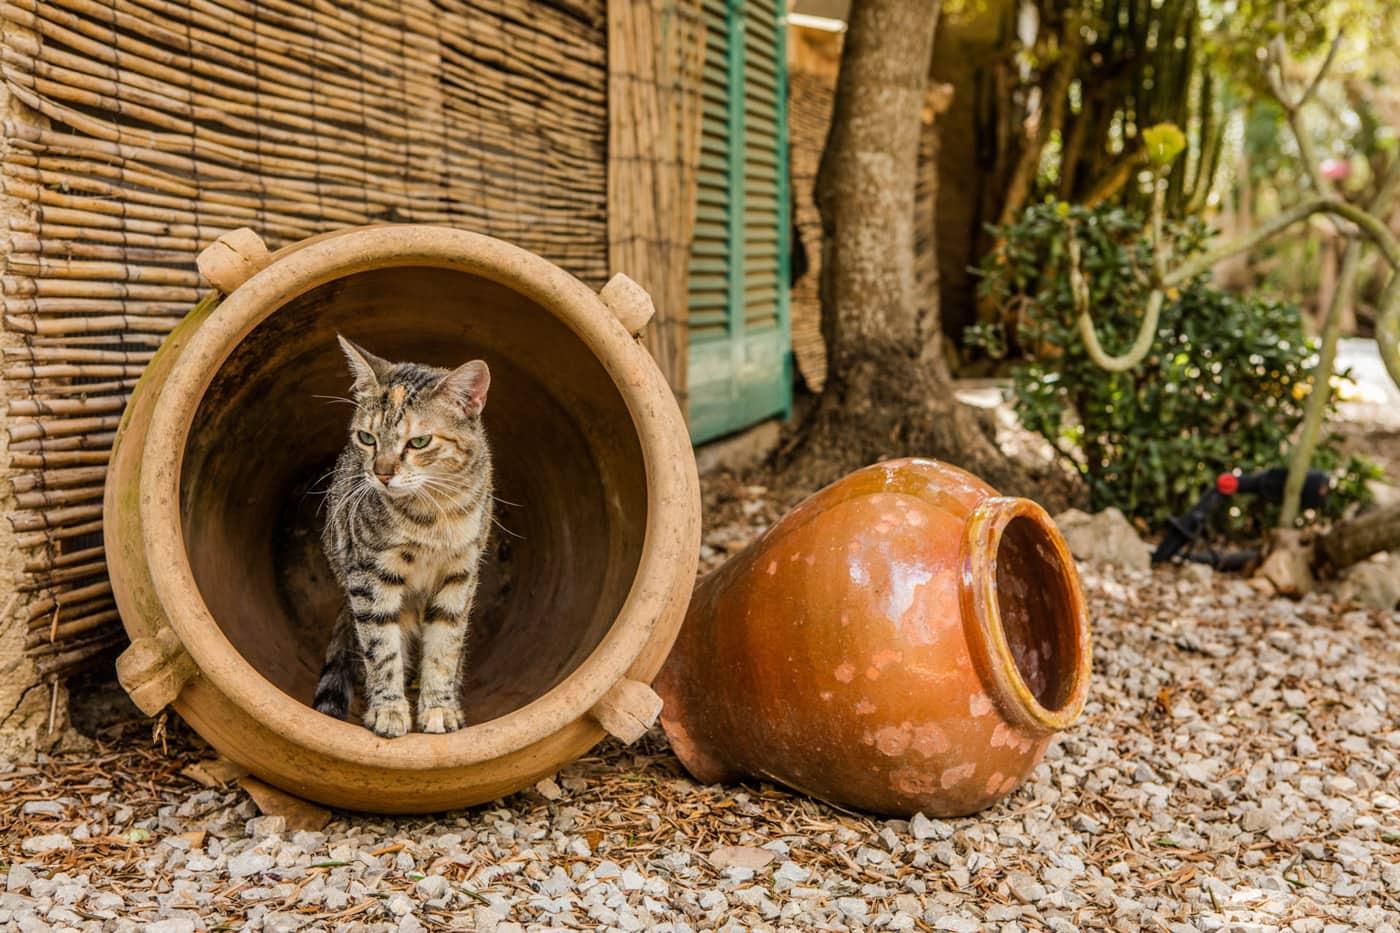 Katze im Tonkrug